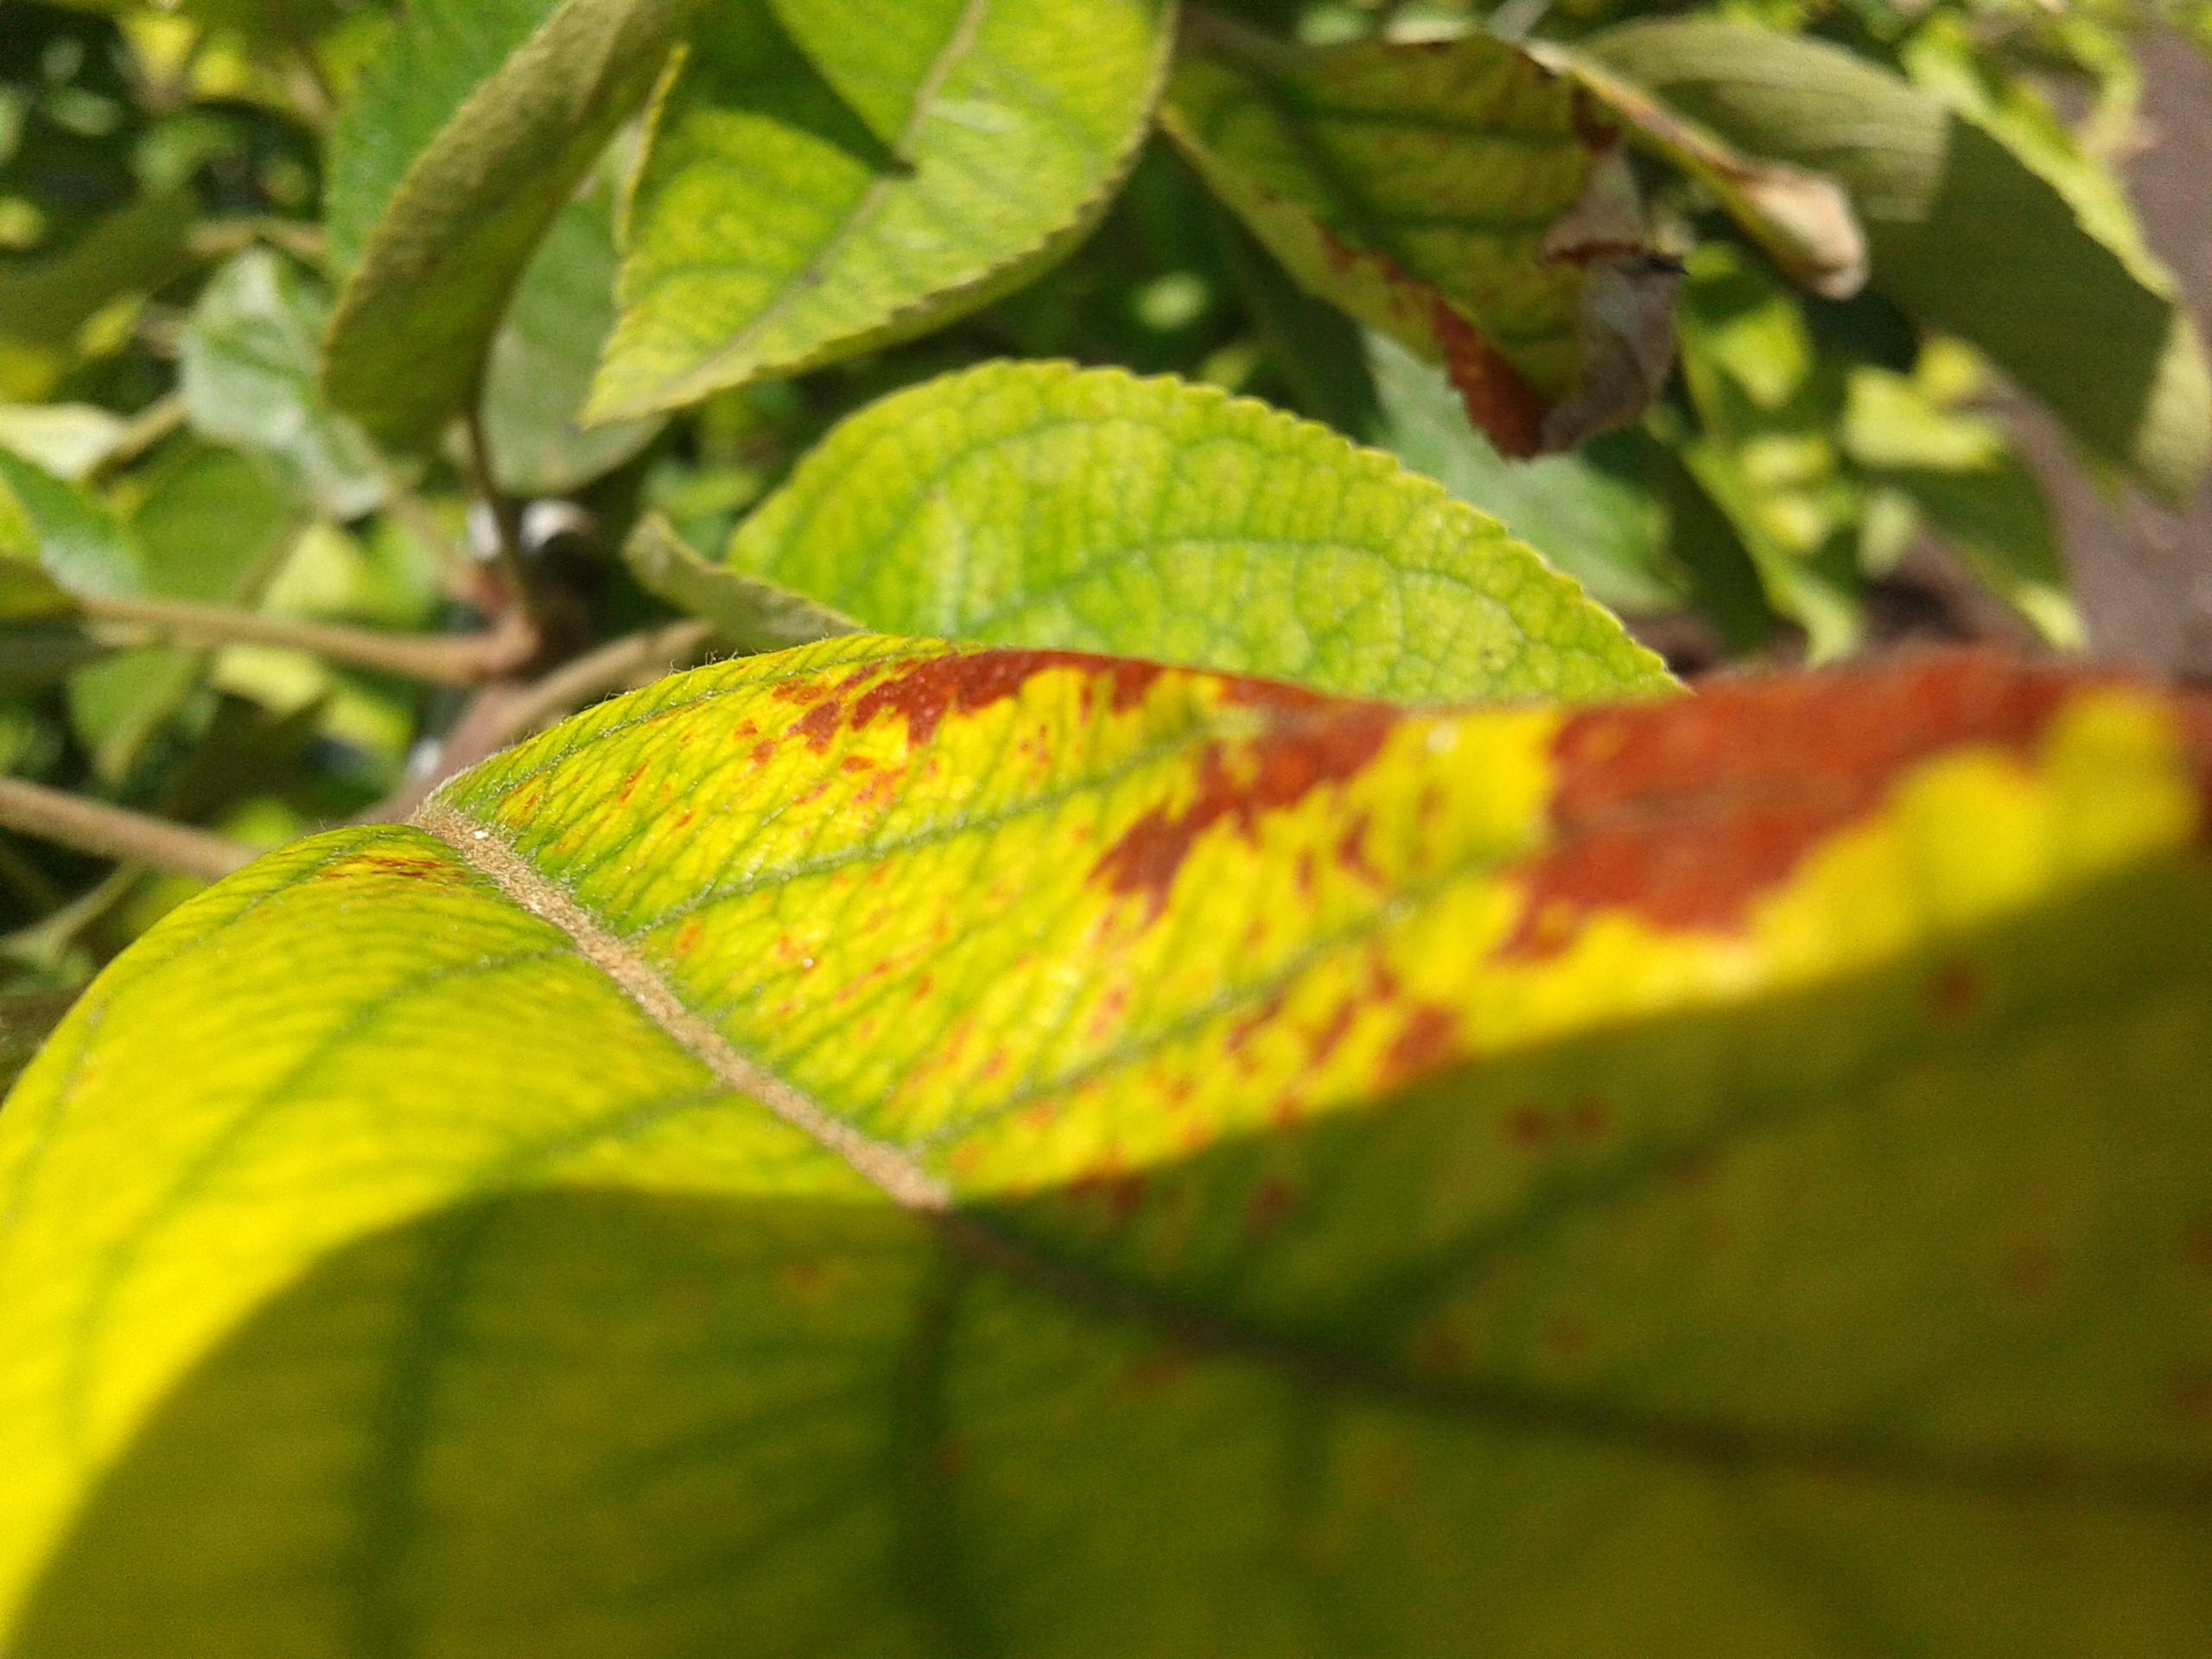 хлороз листьев груши с фото них